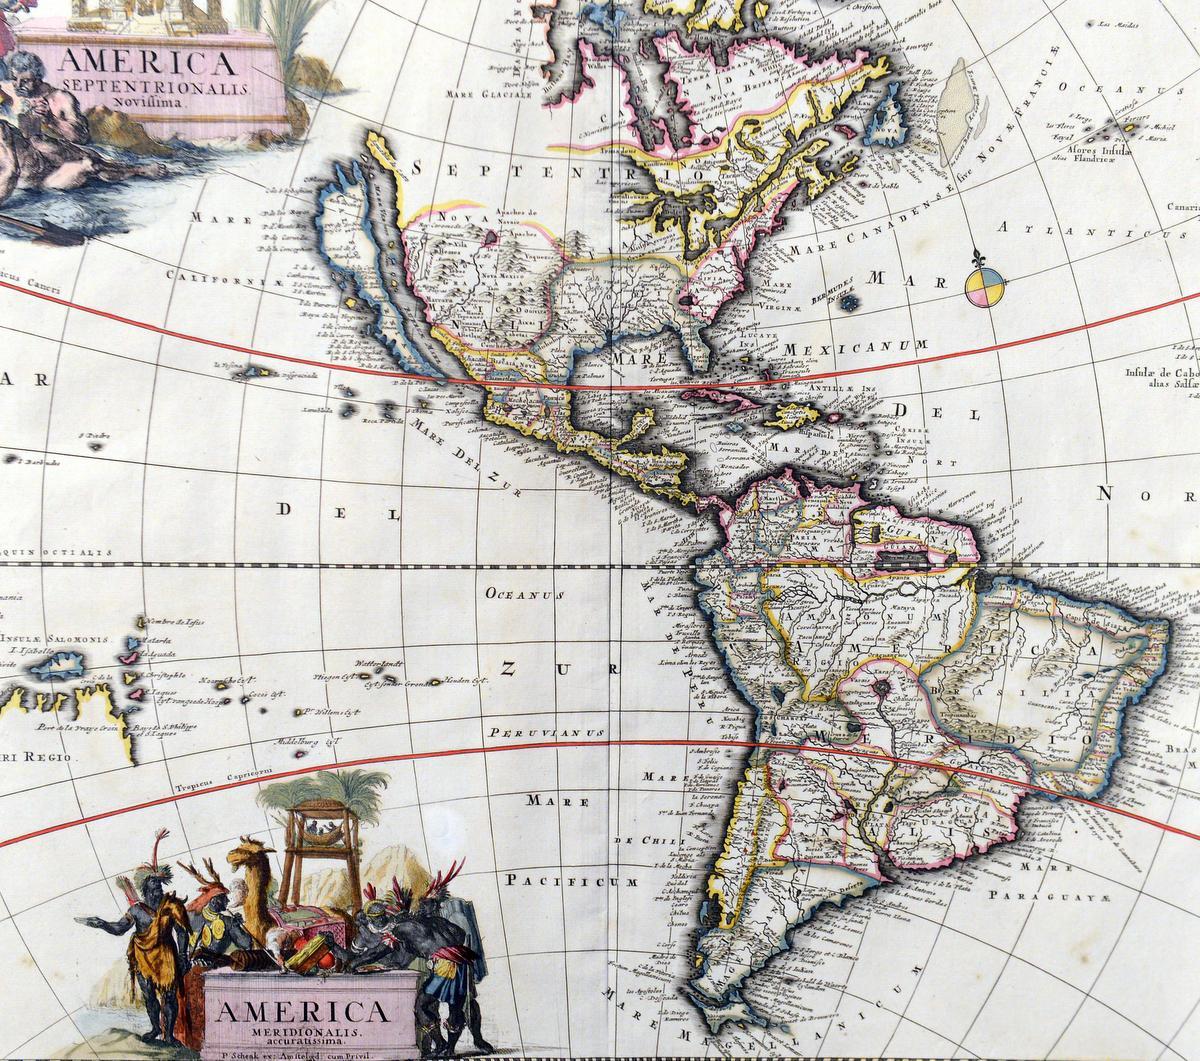 Somos Primos De La Pgina Cesar Flores On Gfci Internal Wiring Diagram The Maps Walls Show A World Where California Is An Island Some Sea Monsters Roaming Oceans